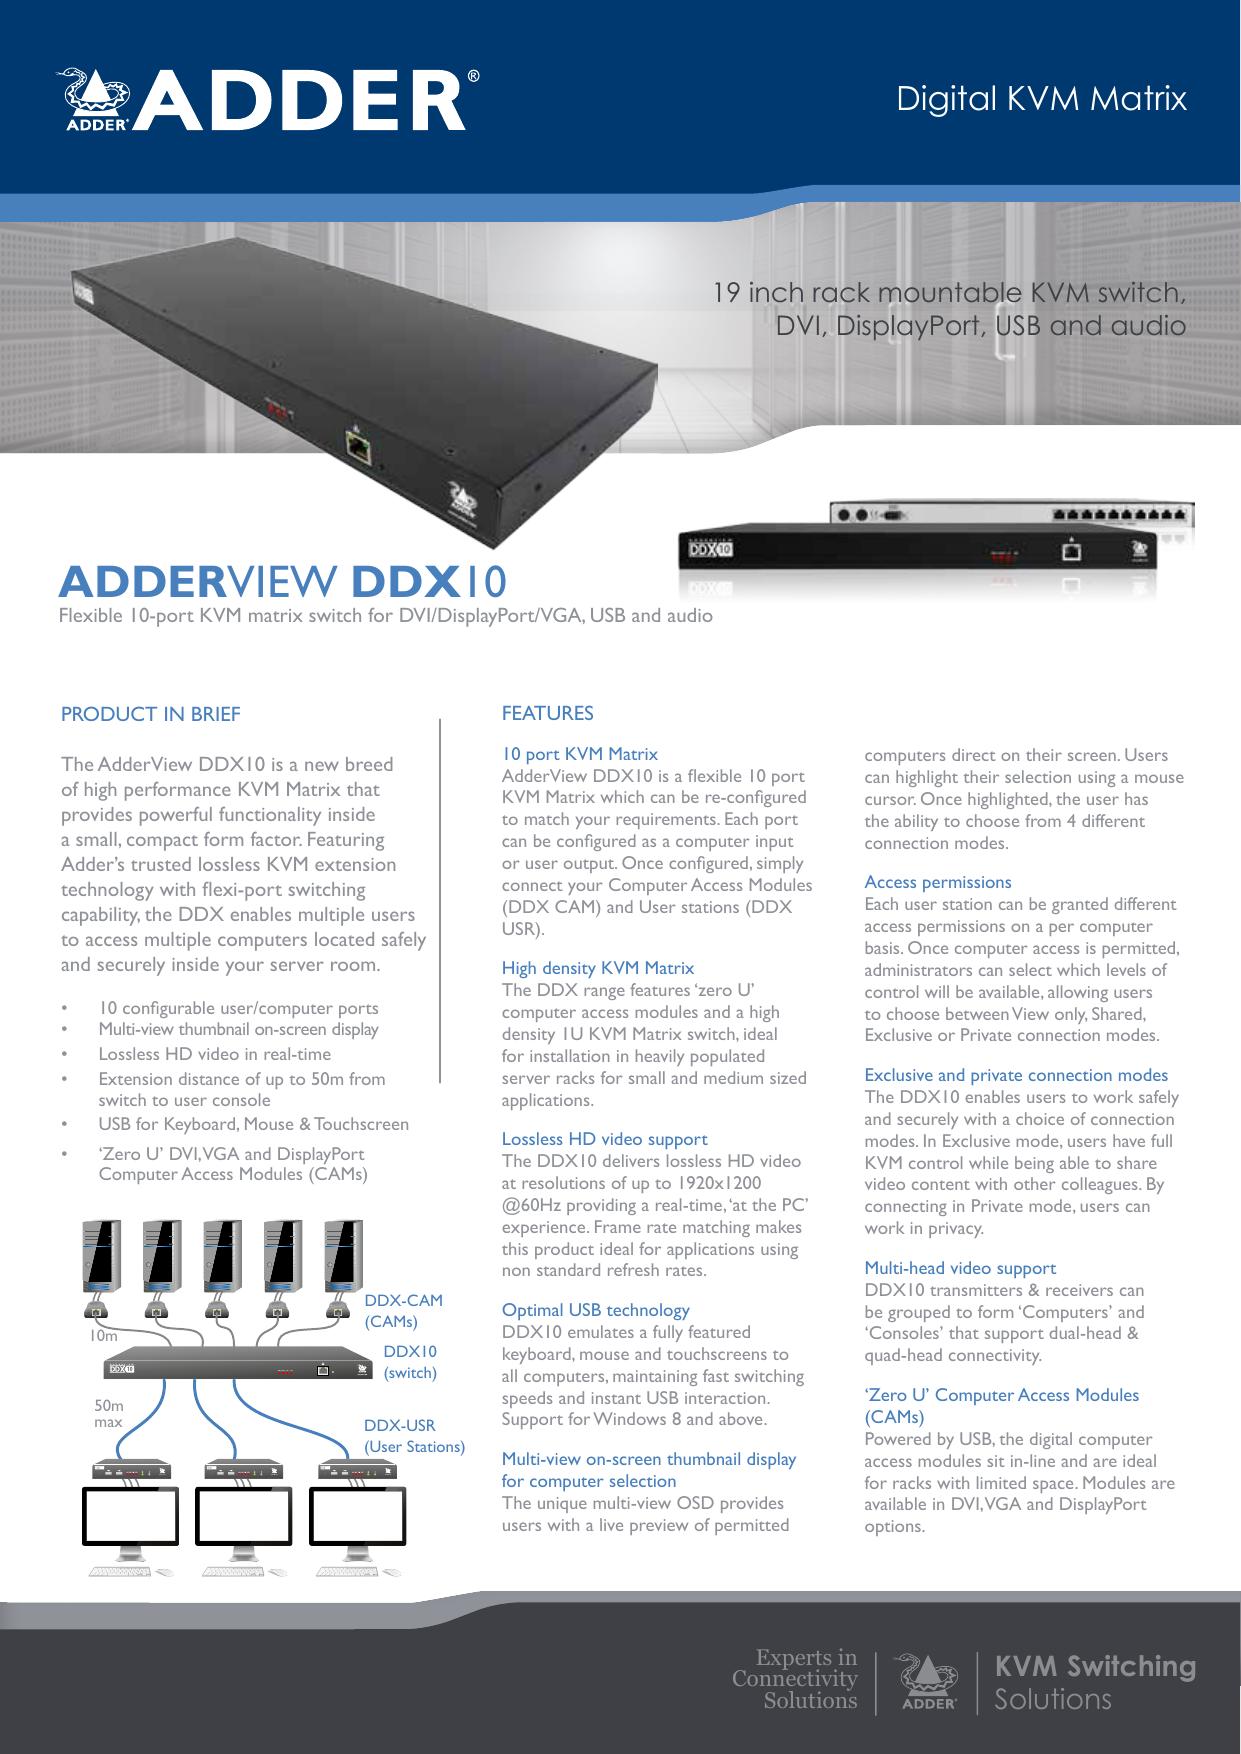 adderview ddx10   manualzz com